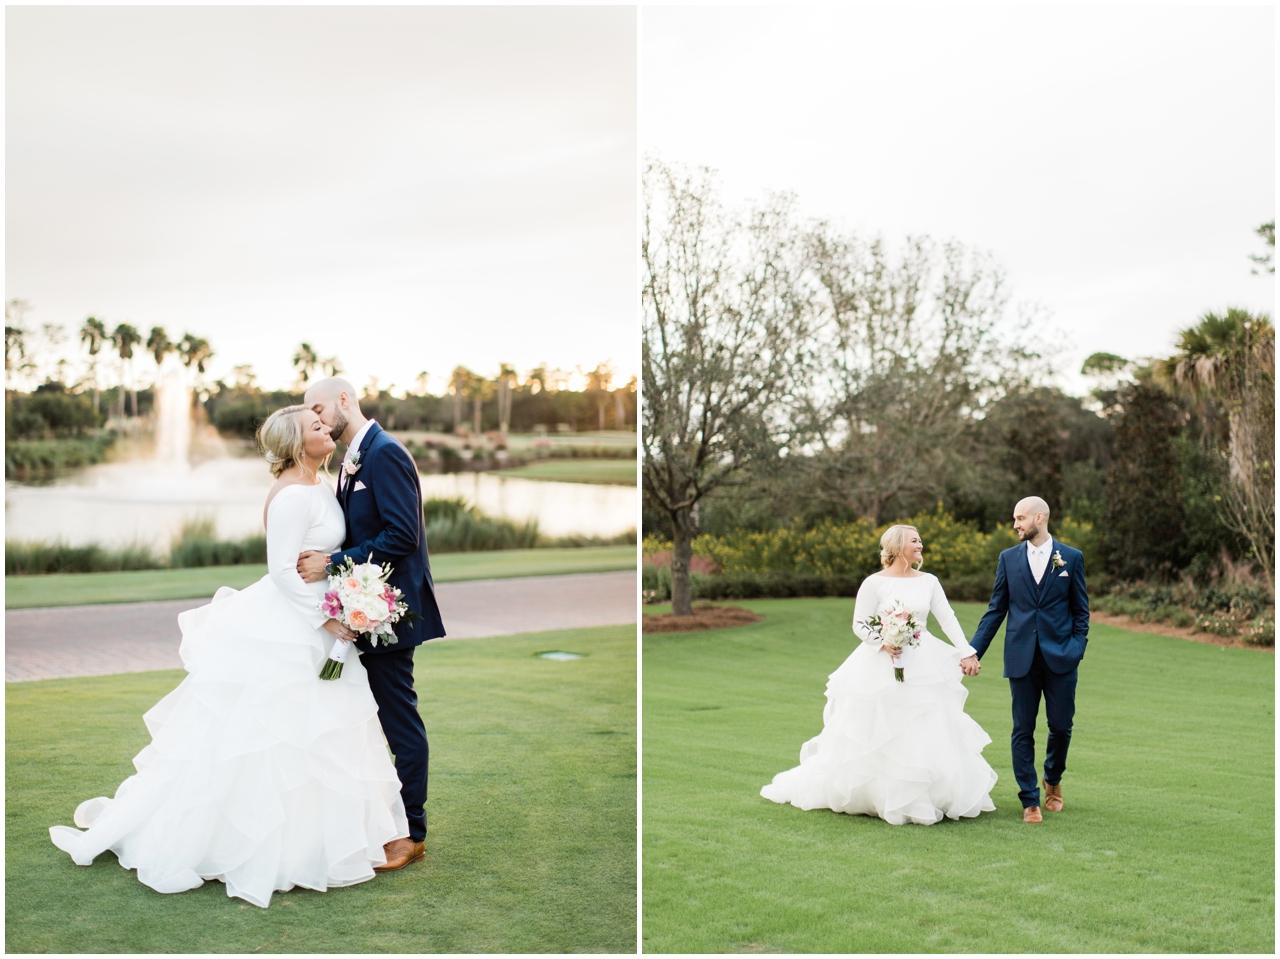 Jacksonville-Wedding-photographers-brooke-images-TPC-Sawgrass-Wedding-Mary-Kevin-blog_0039.jpg